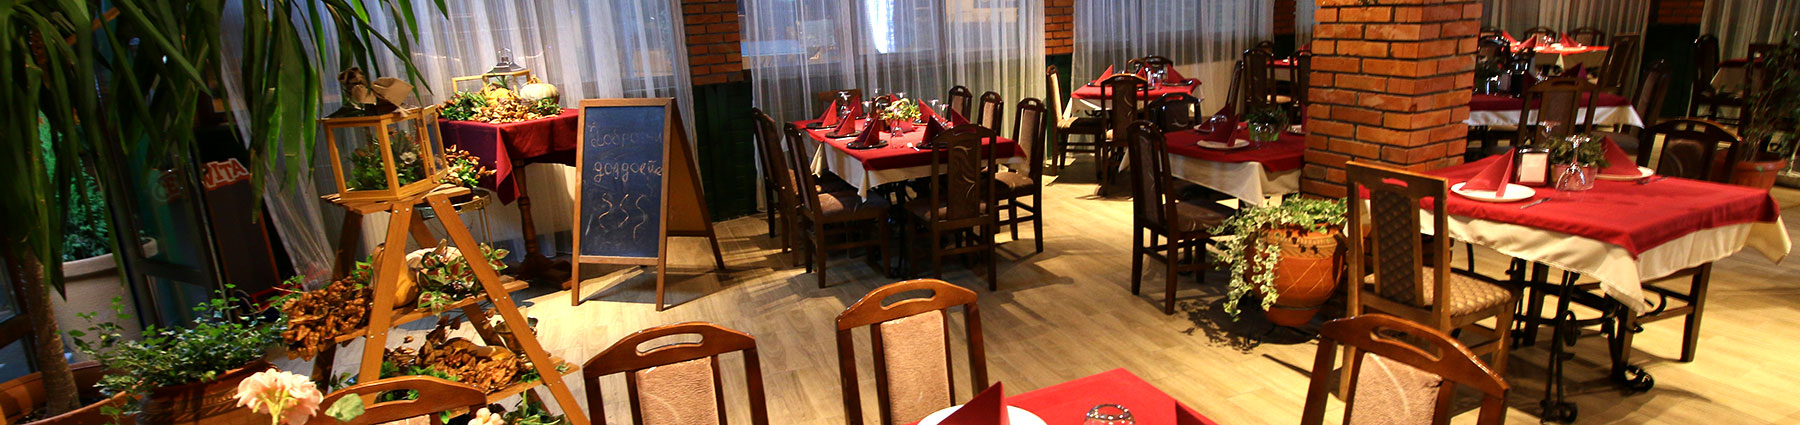 Ресторан Камин Кама